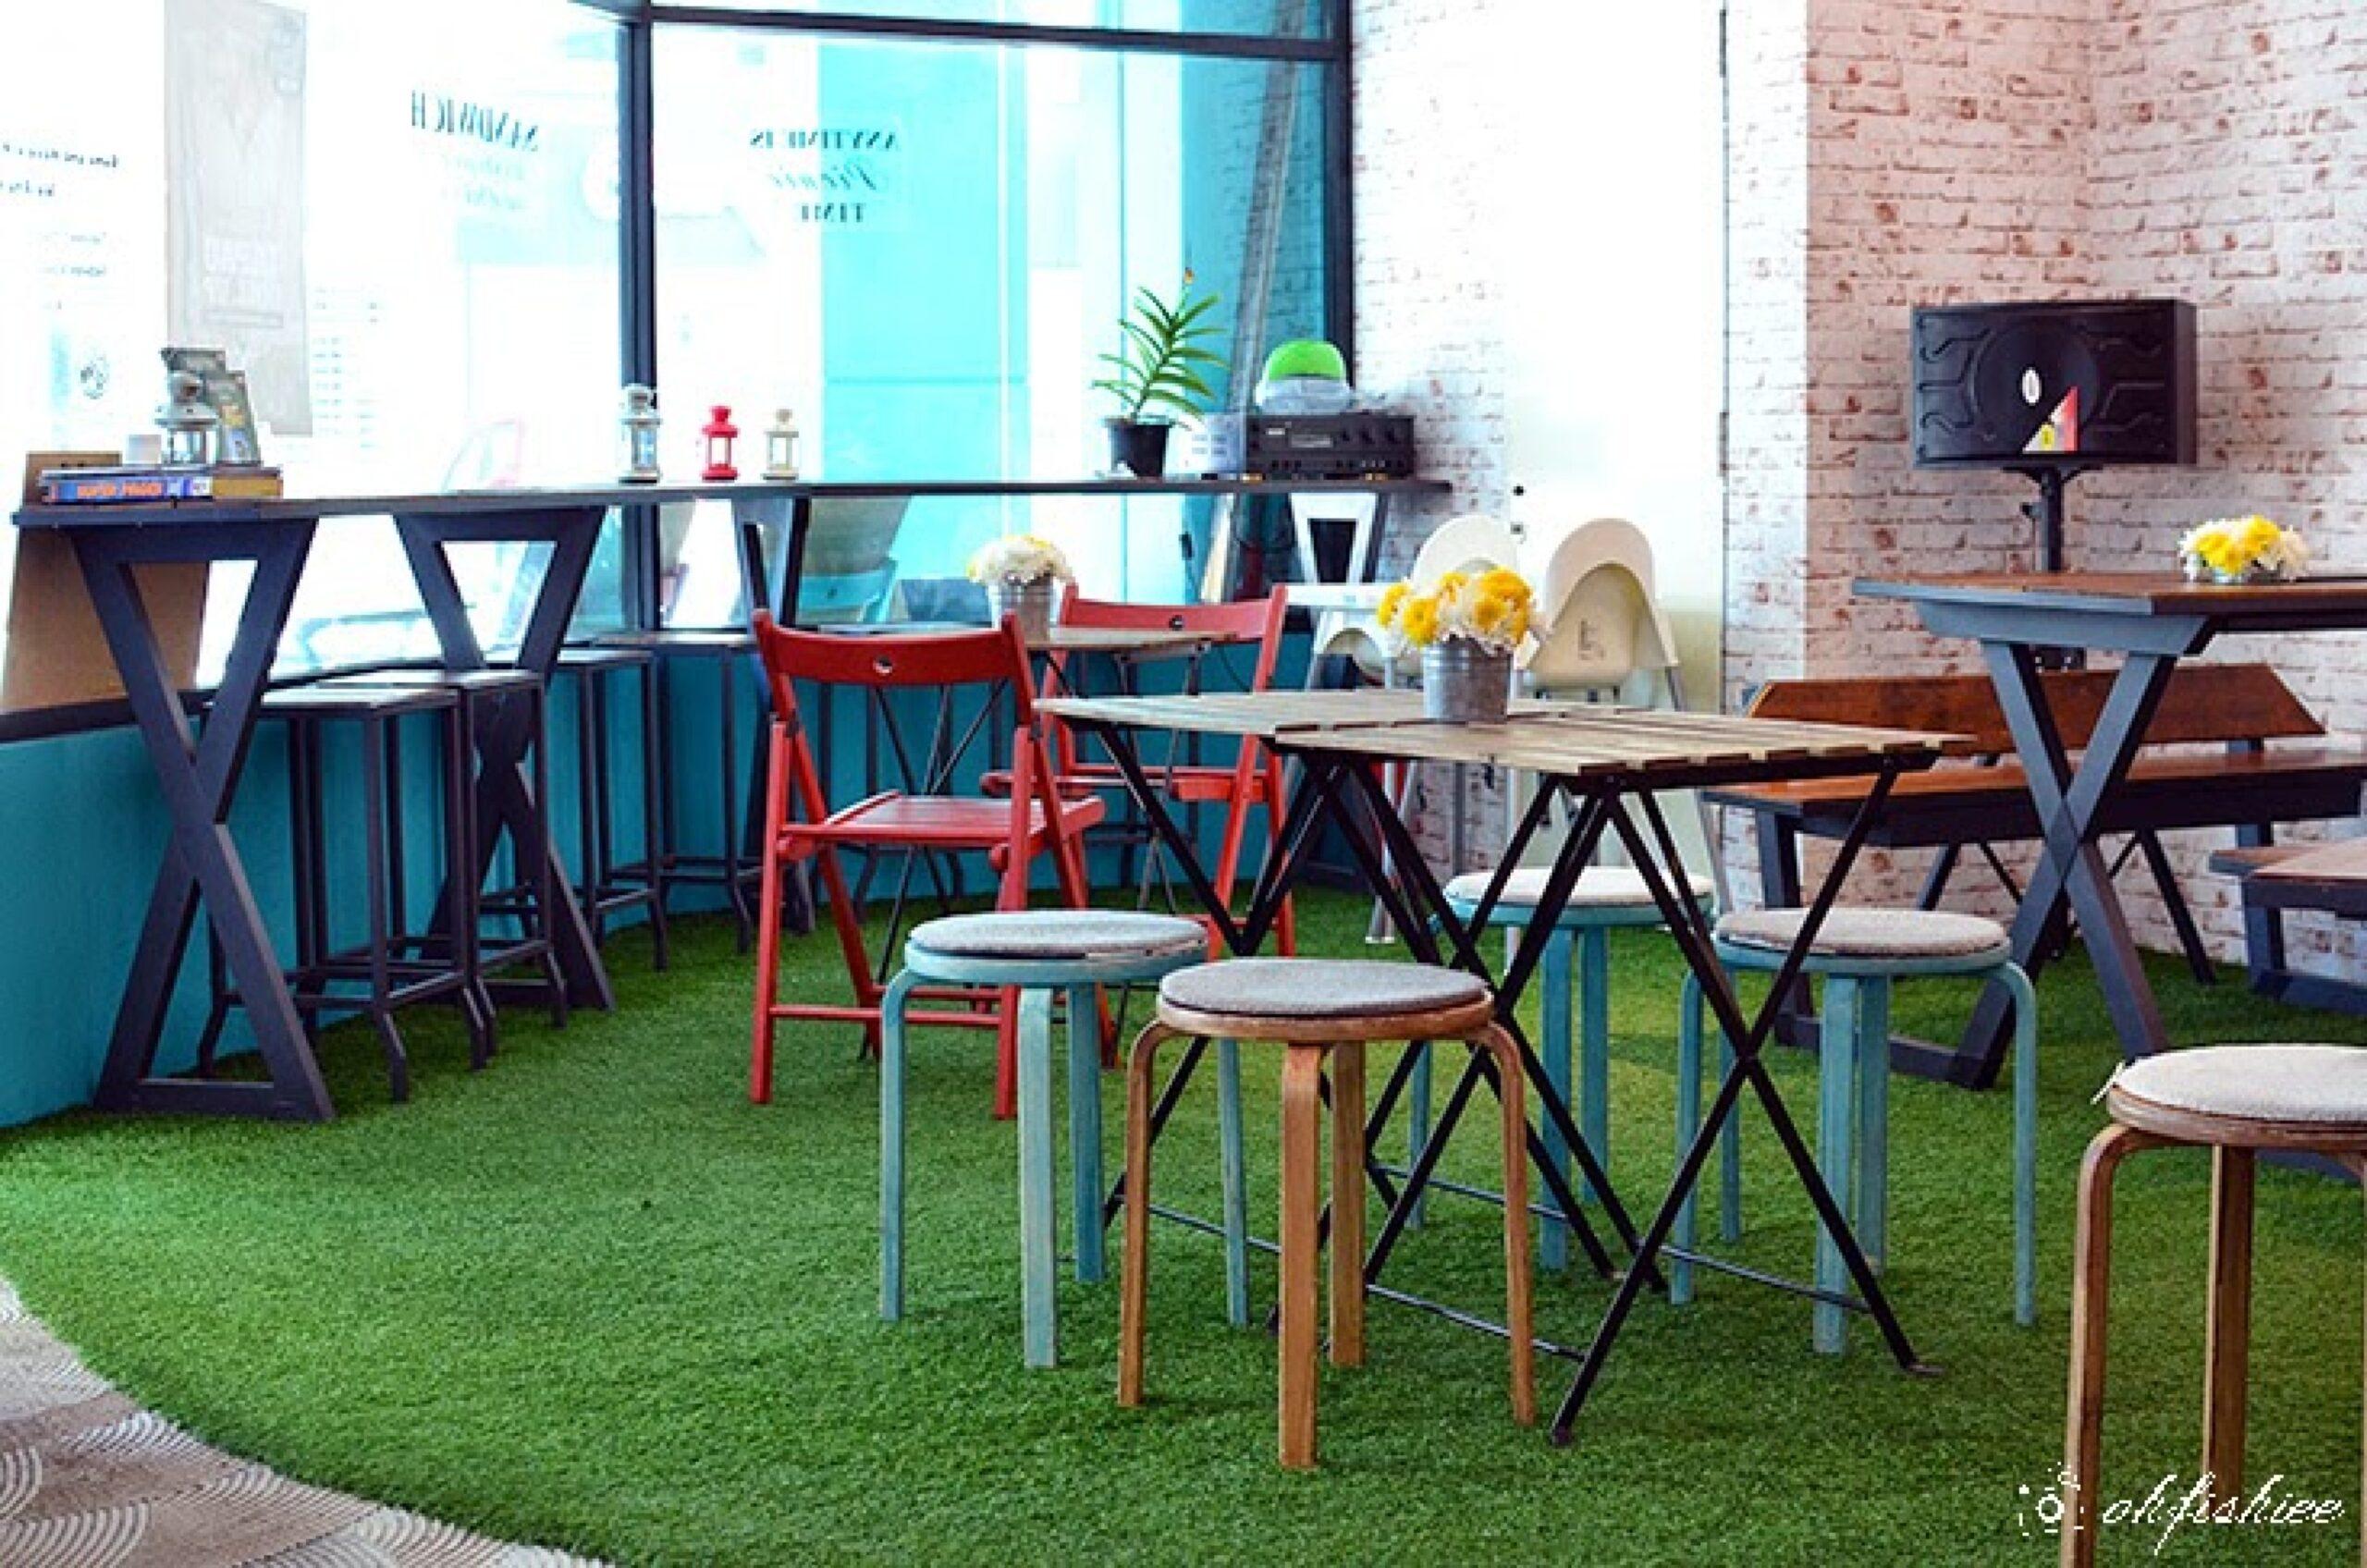 UNIQUE INSTAGRAMMABLE CAFES IN SELANGOR 5